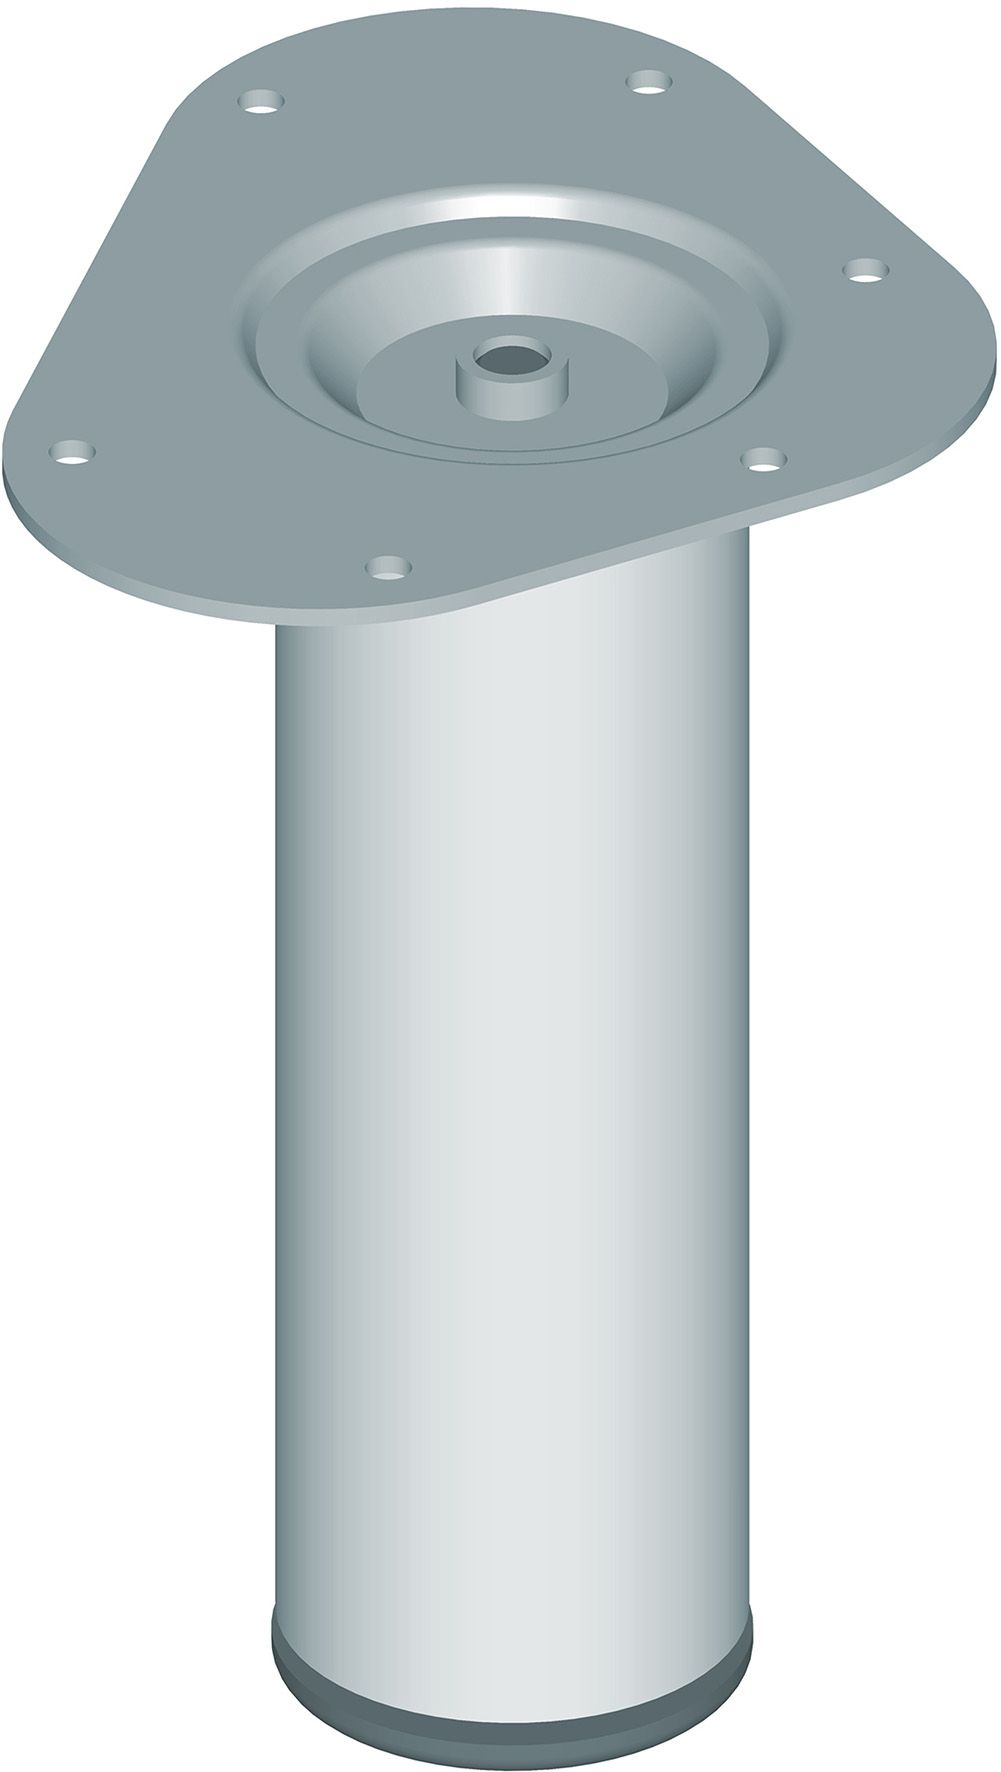 Mööblijalg Element System 200 mm